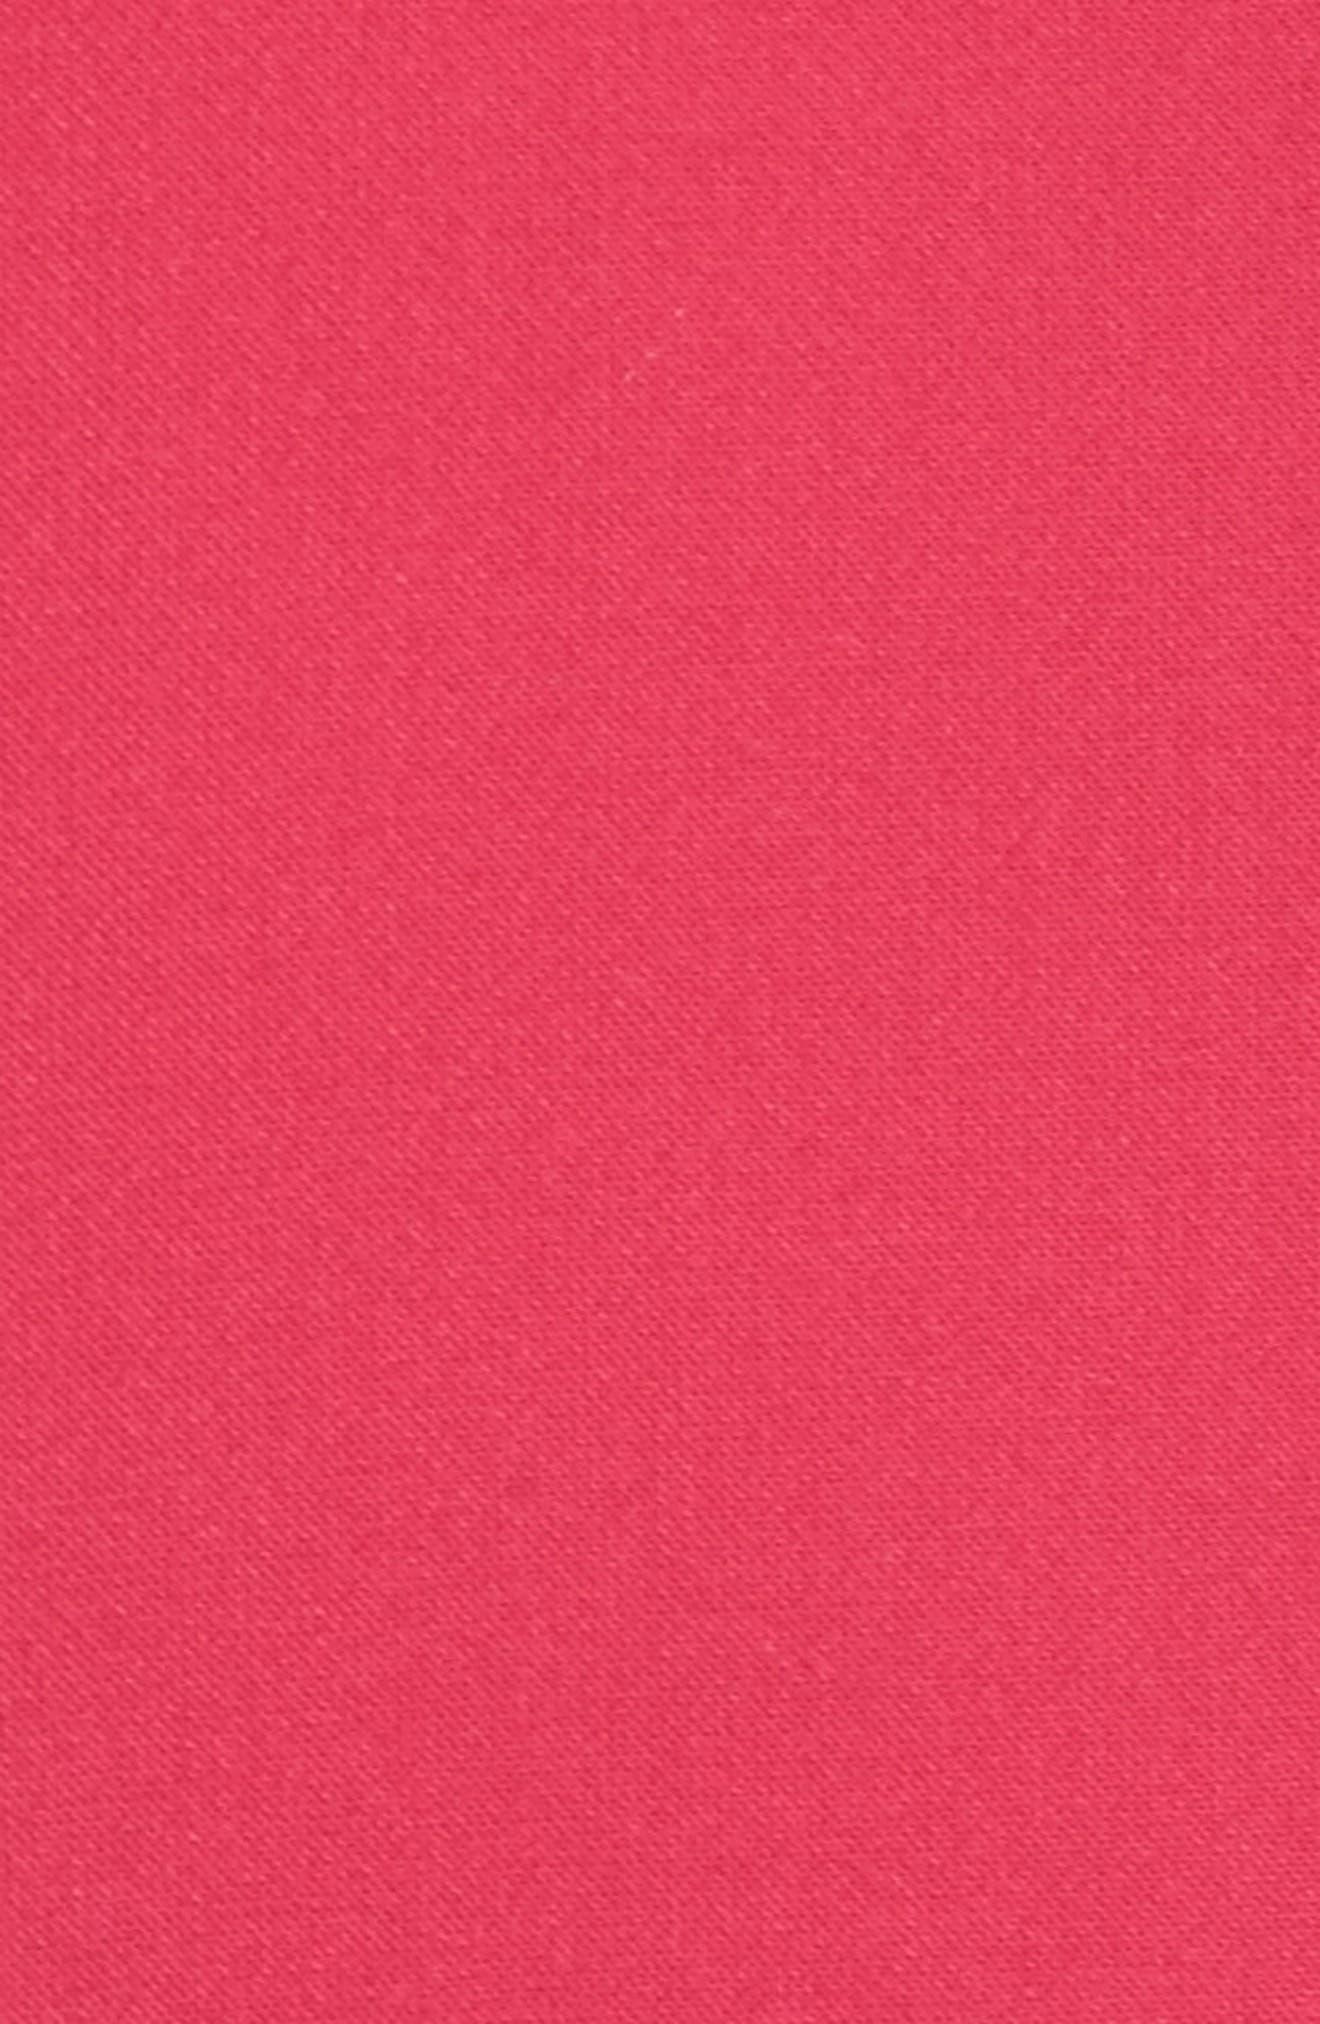 Whisper Light Sheath Dress,                             Alternate thumbnail 6, color,                             666